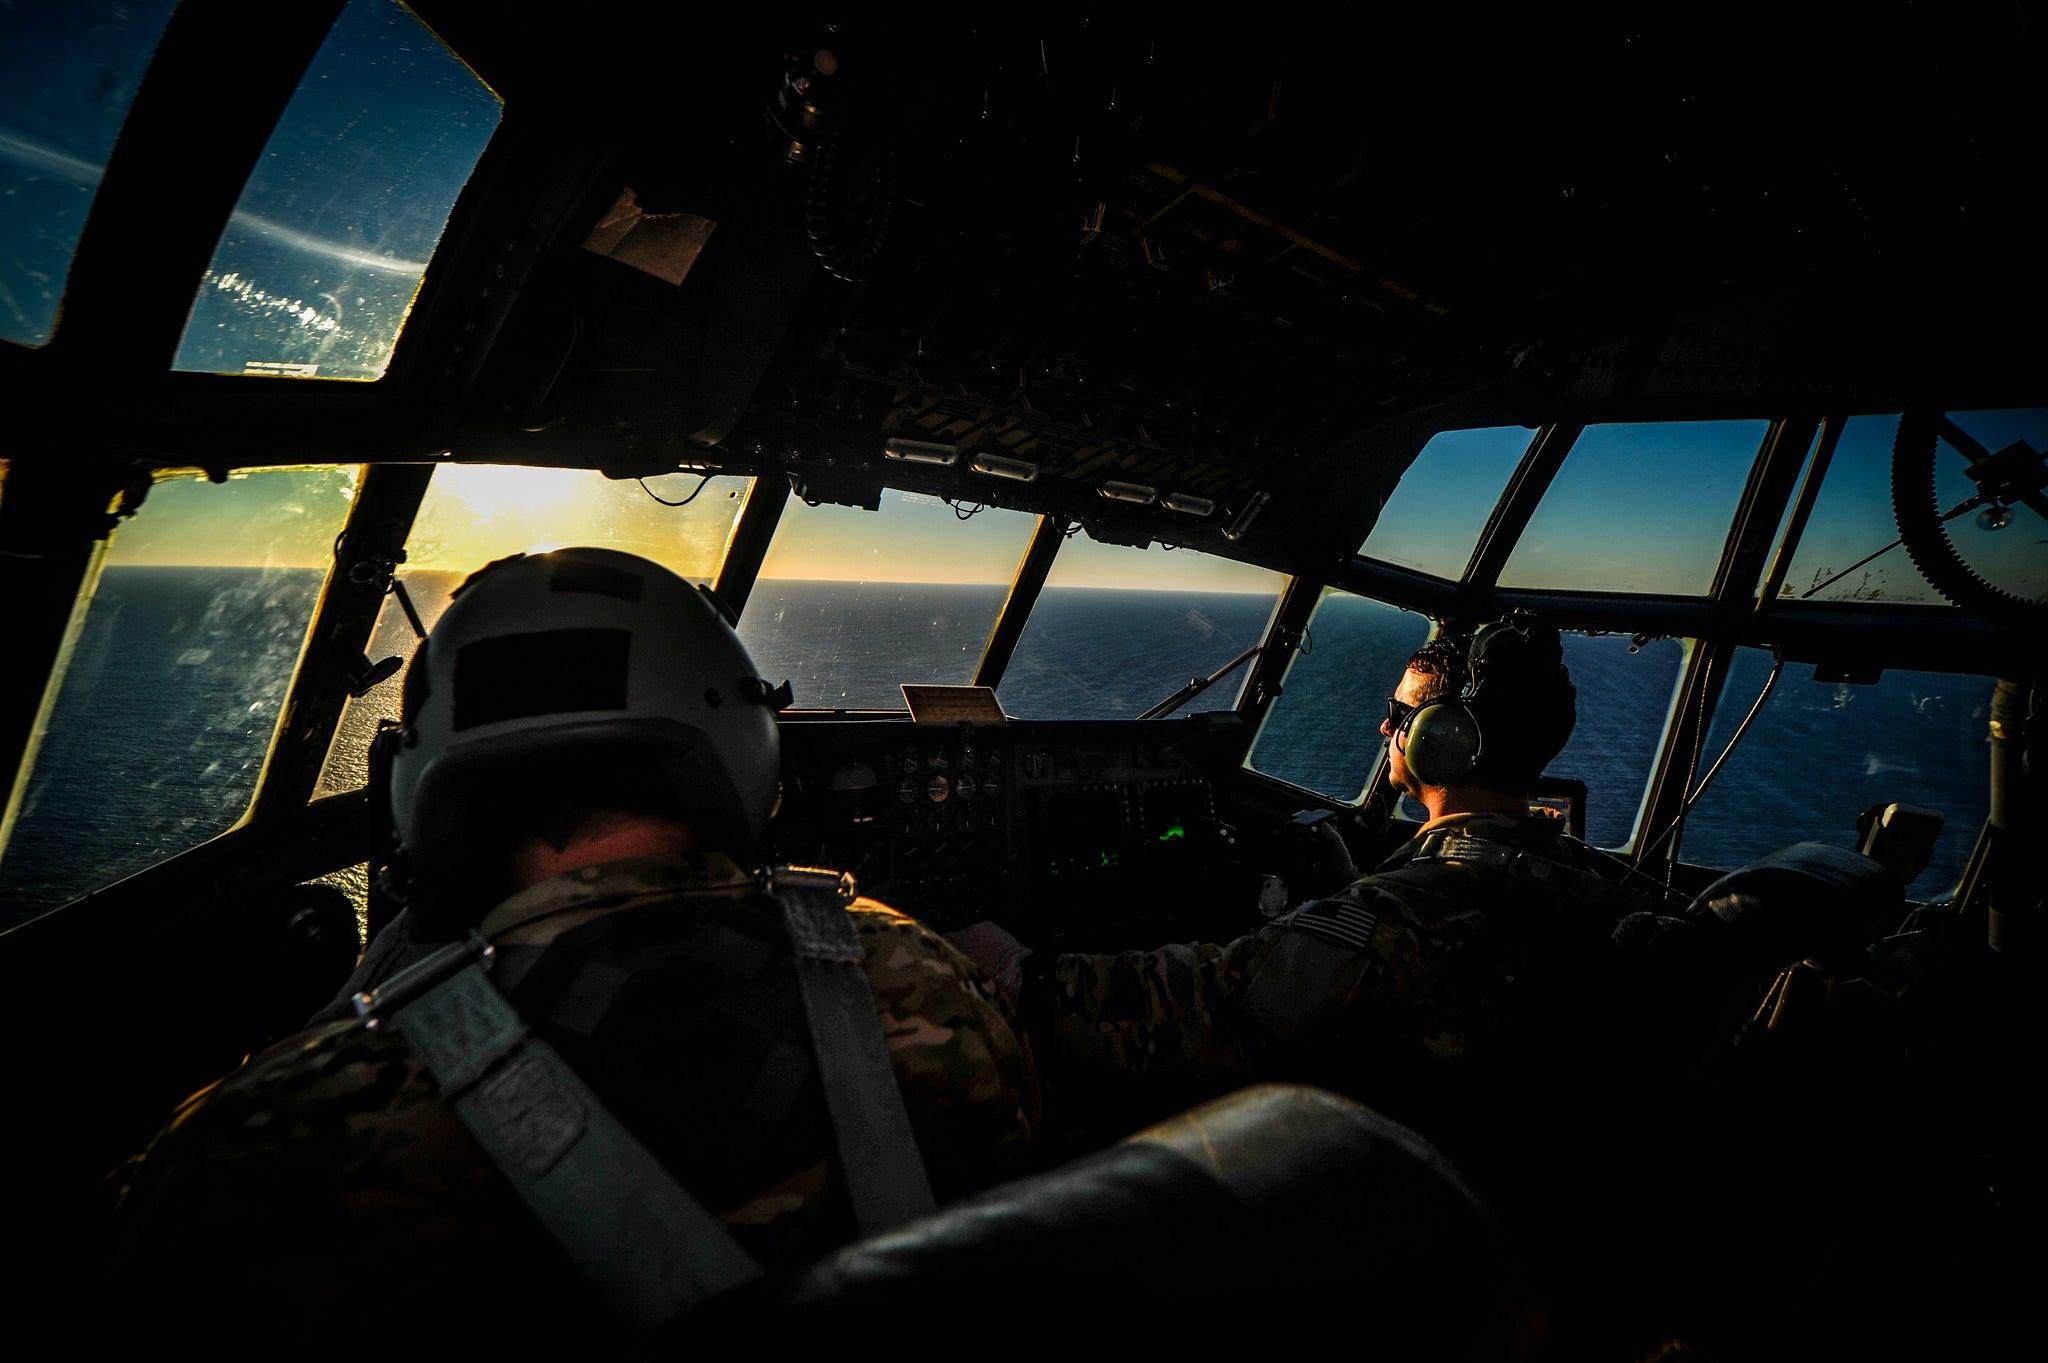 A beautiful photo of the cockpit of the Lockheed MC-130